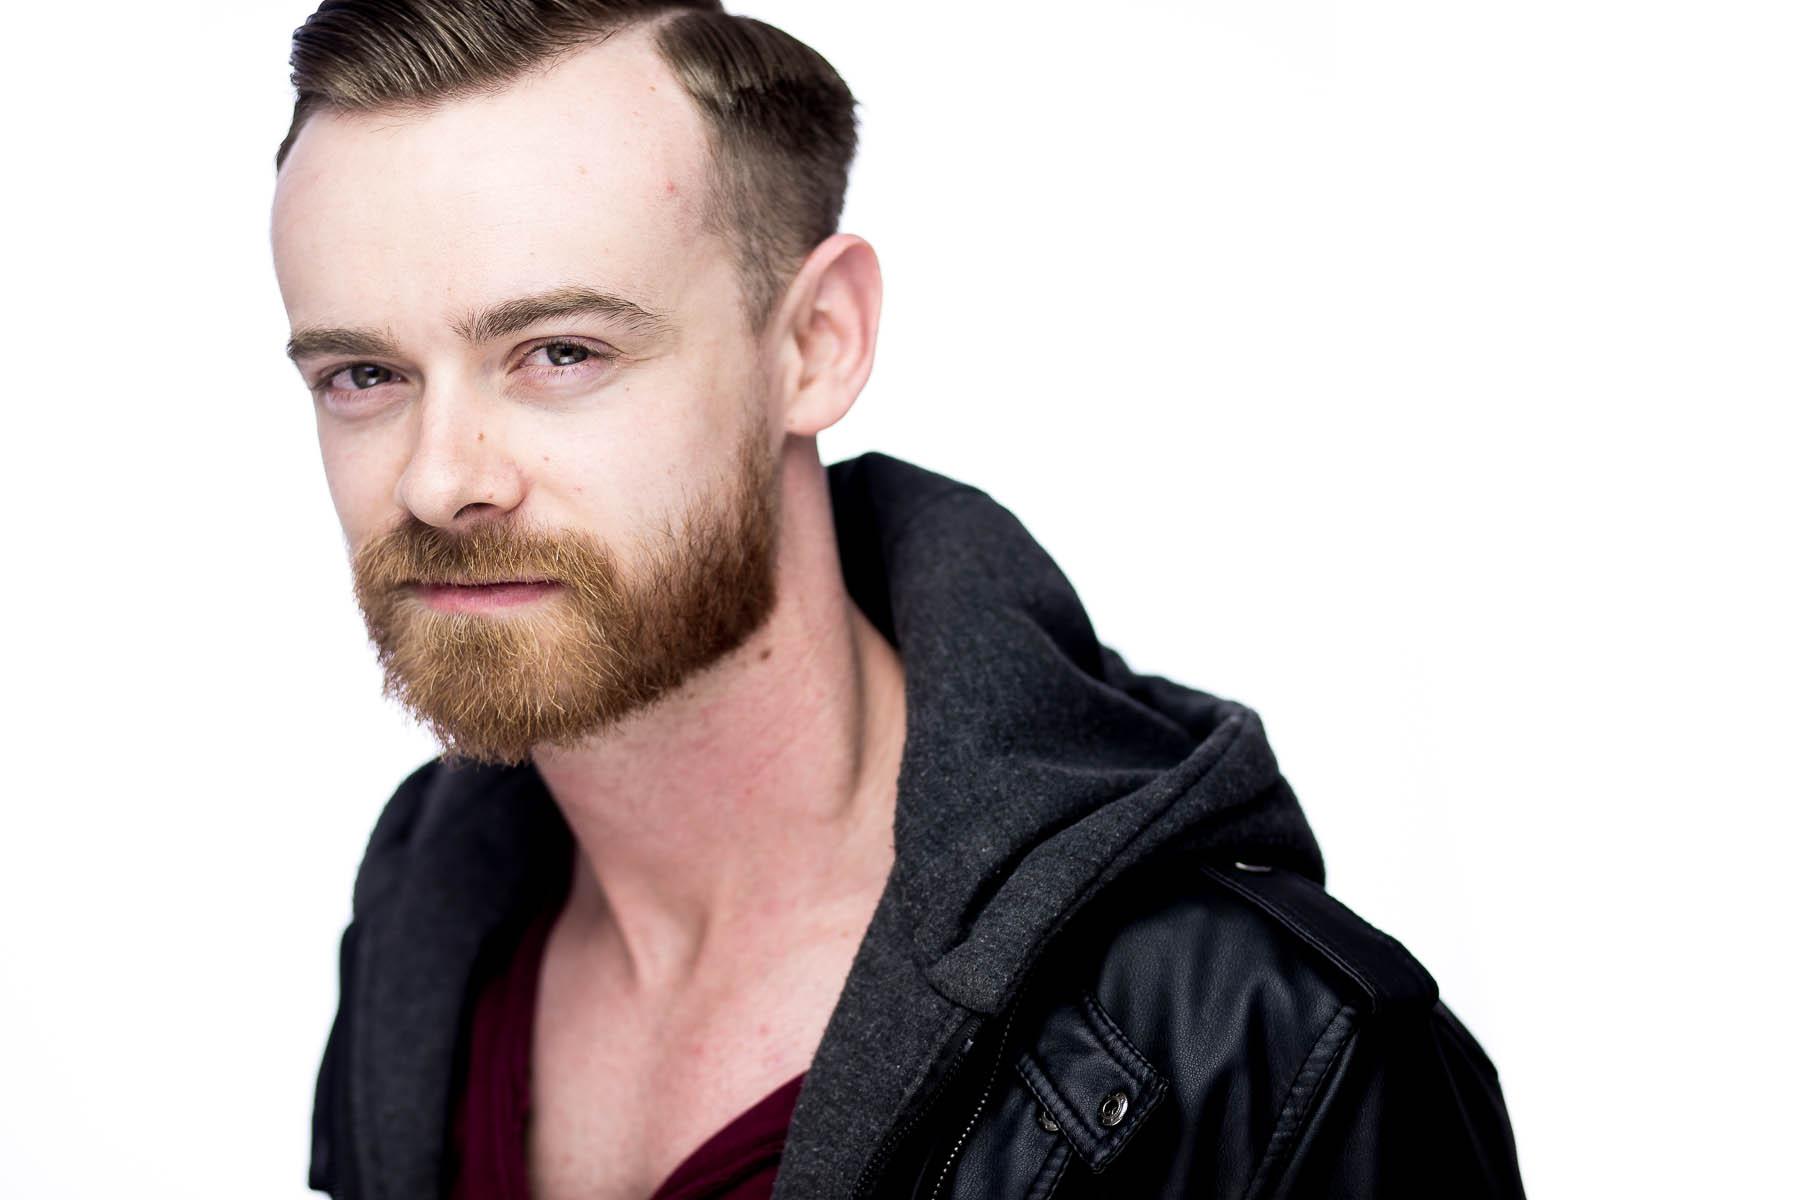 matt-actor-professional-headshot-session-3.jpg